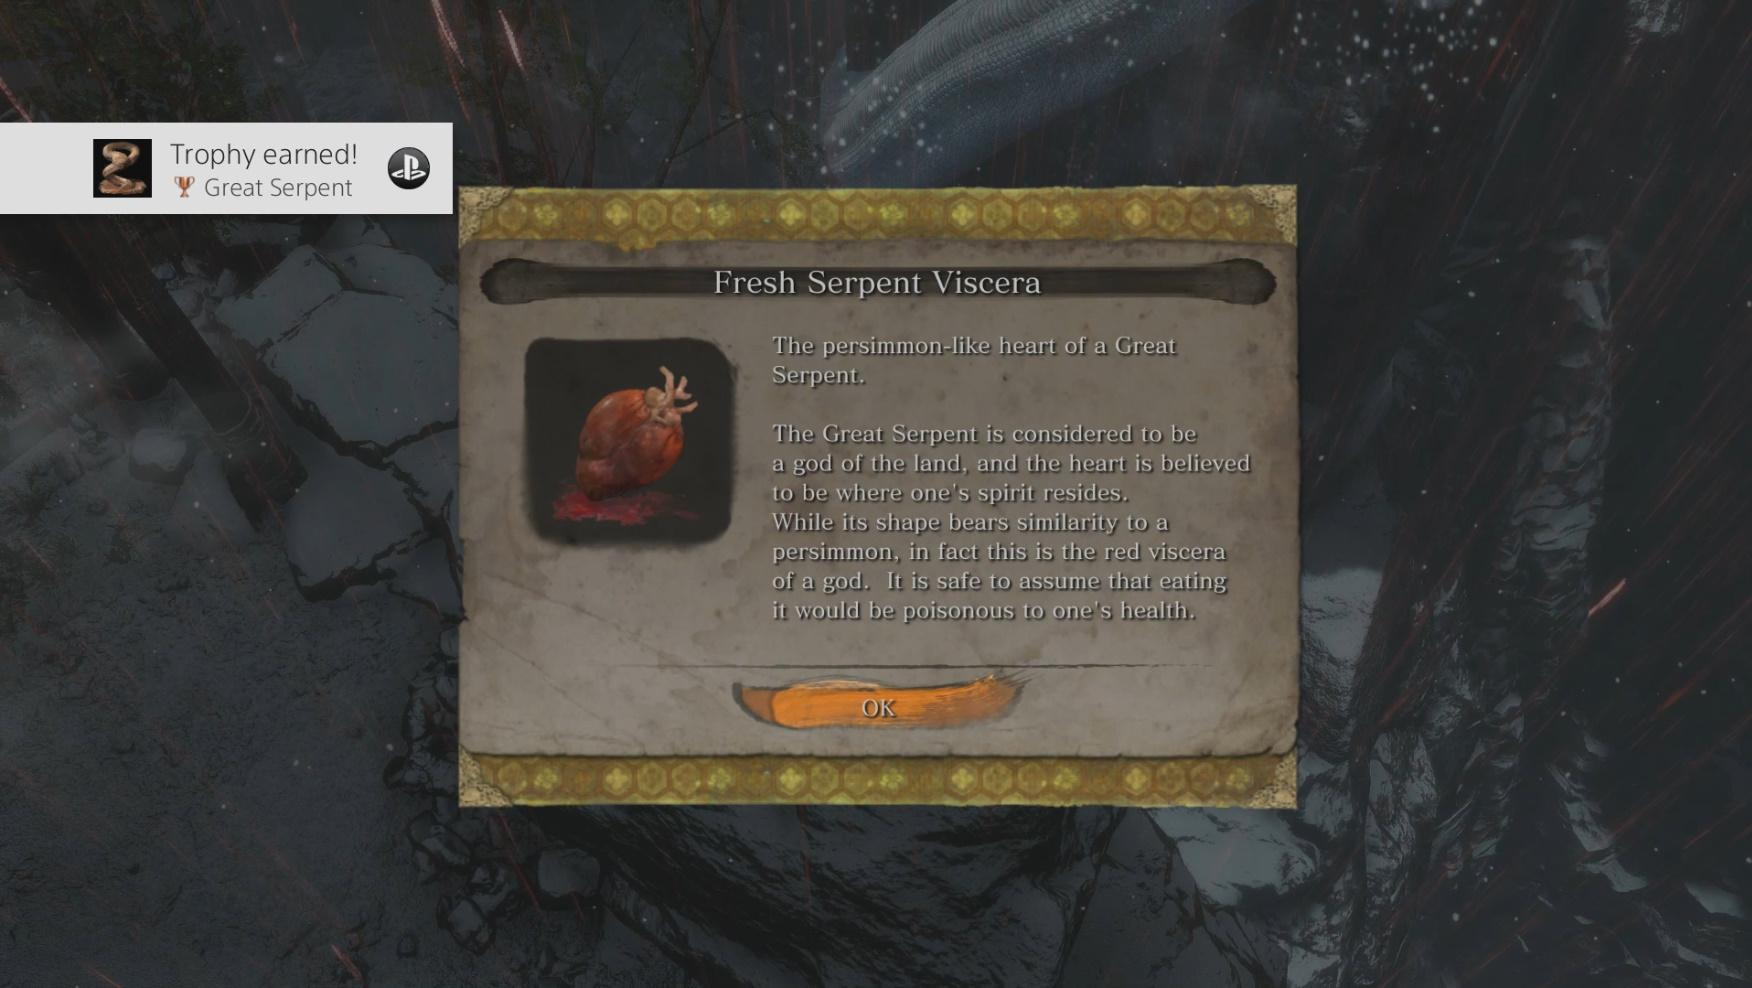 How to Get the Fresh Serpent Viscera item